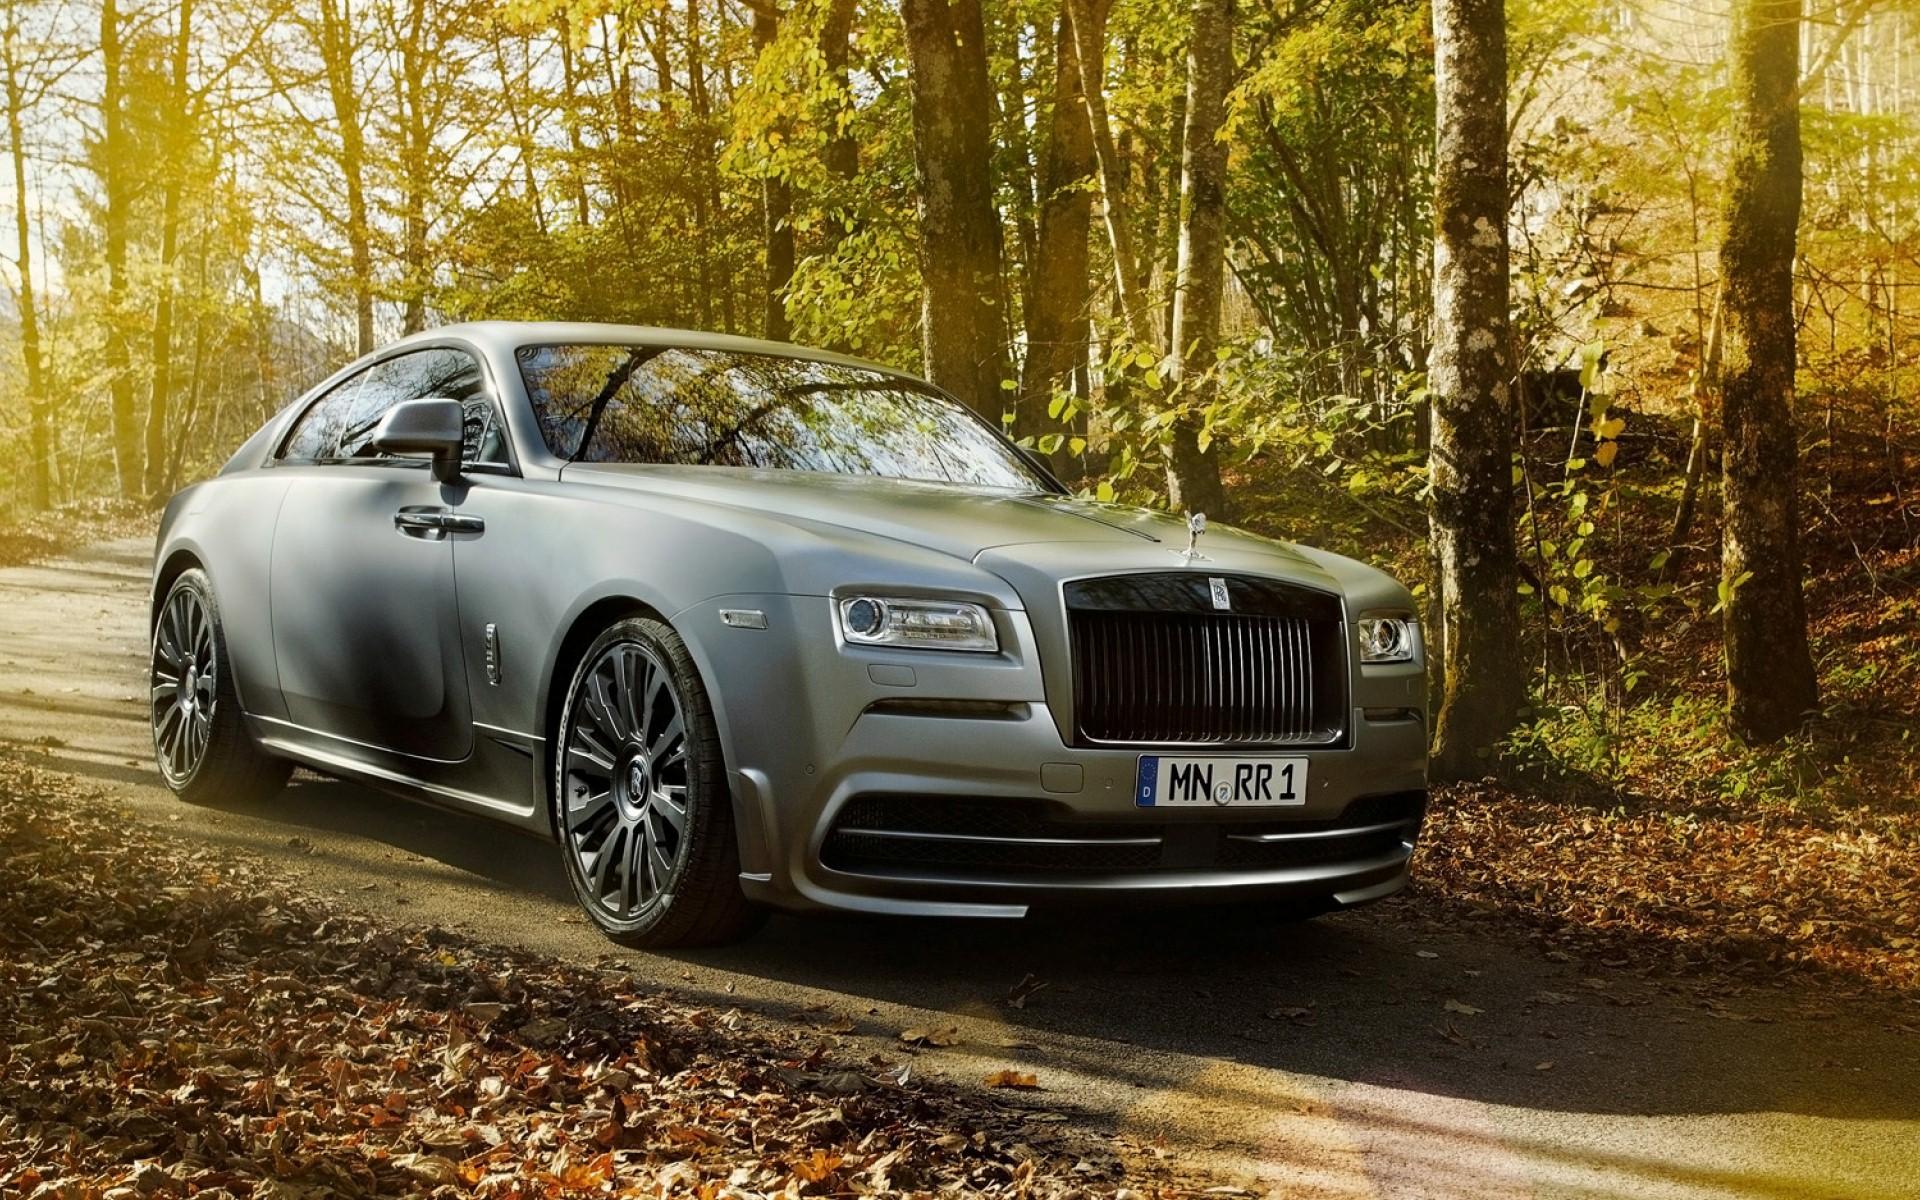 Download Rolls Royce Car Hd Wallpaper Hd Wallpapers 1920x1200 26